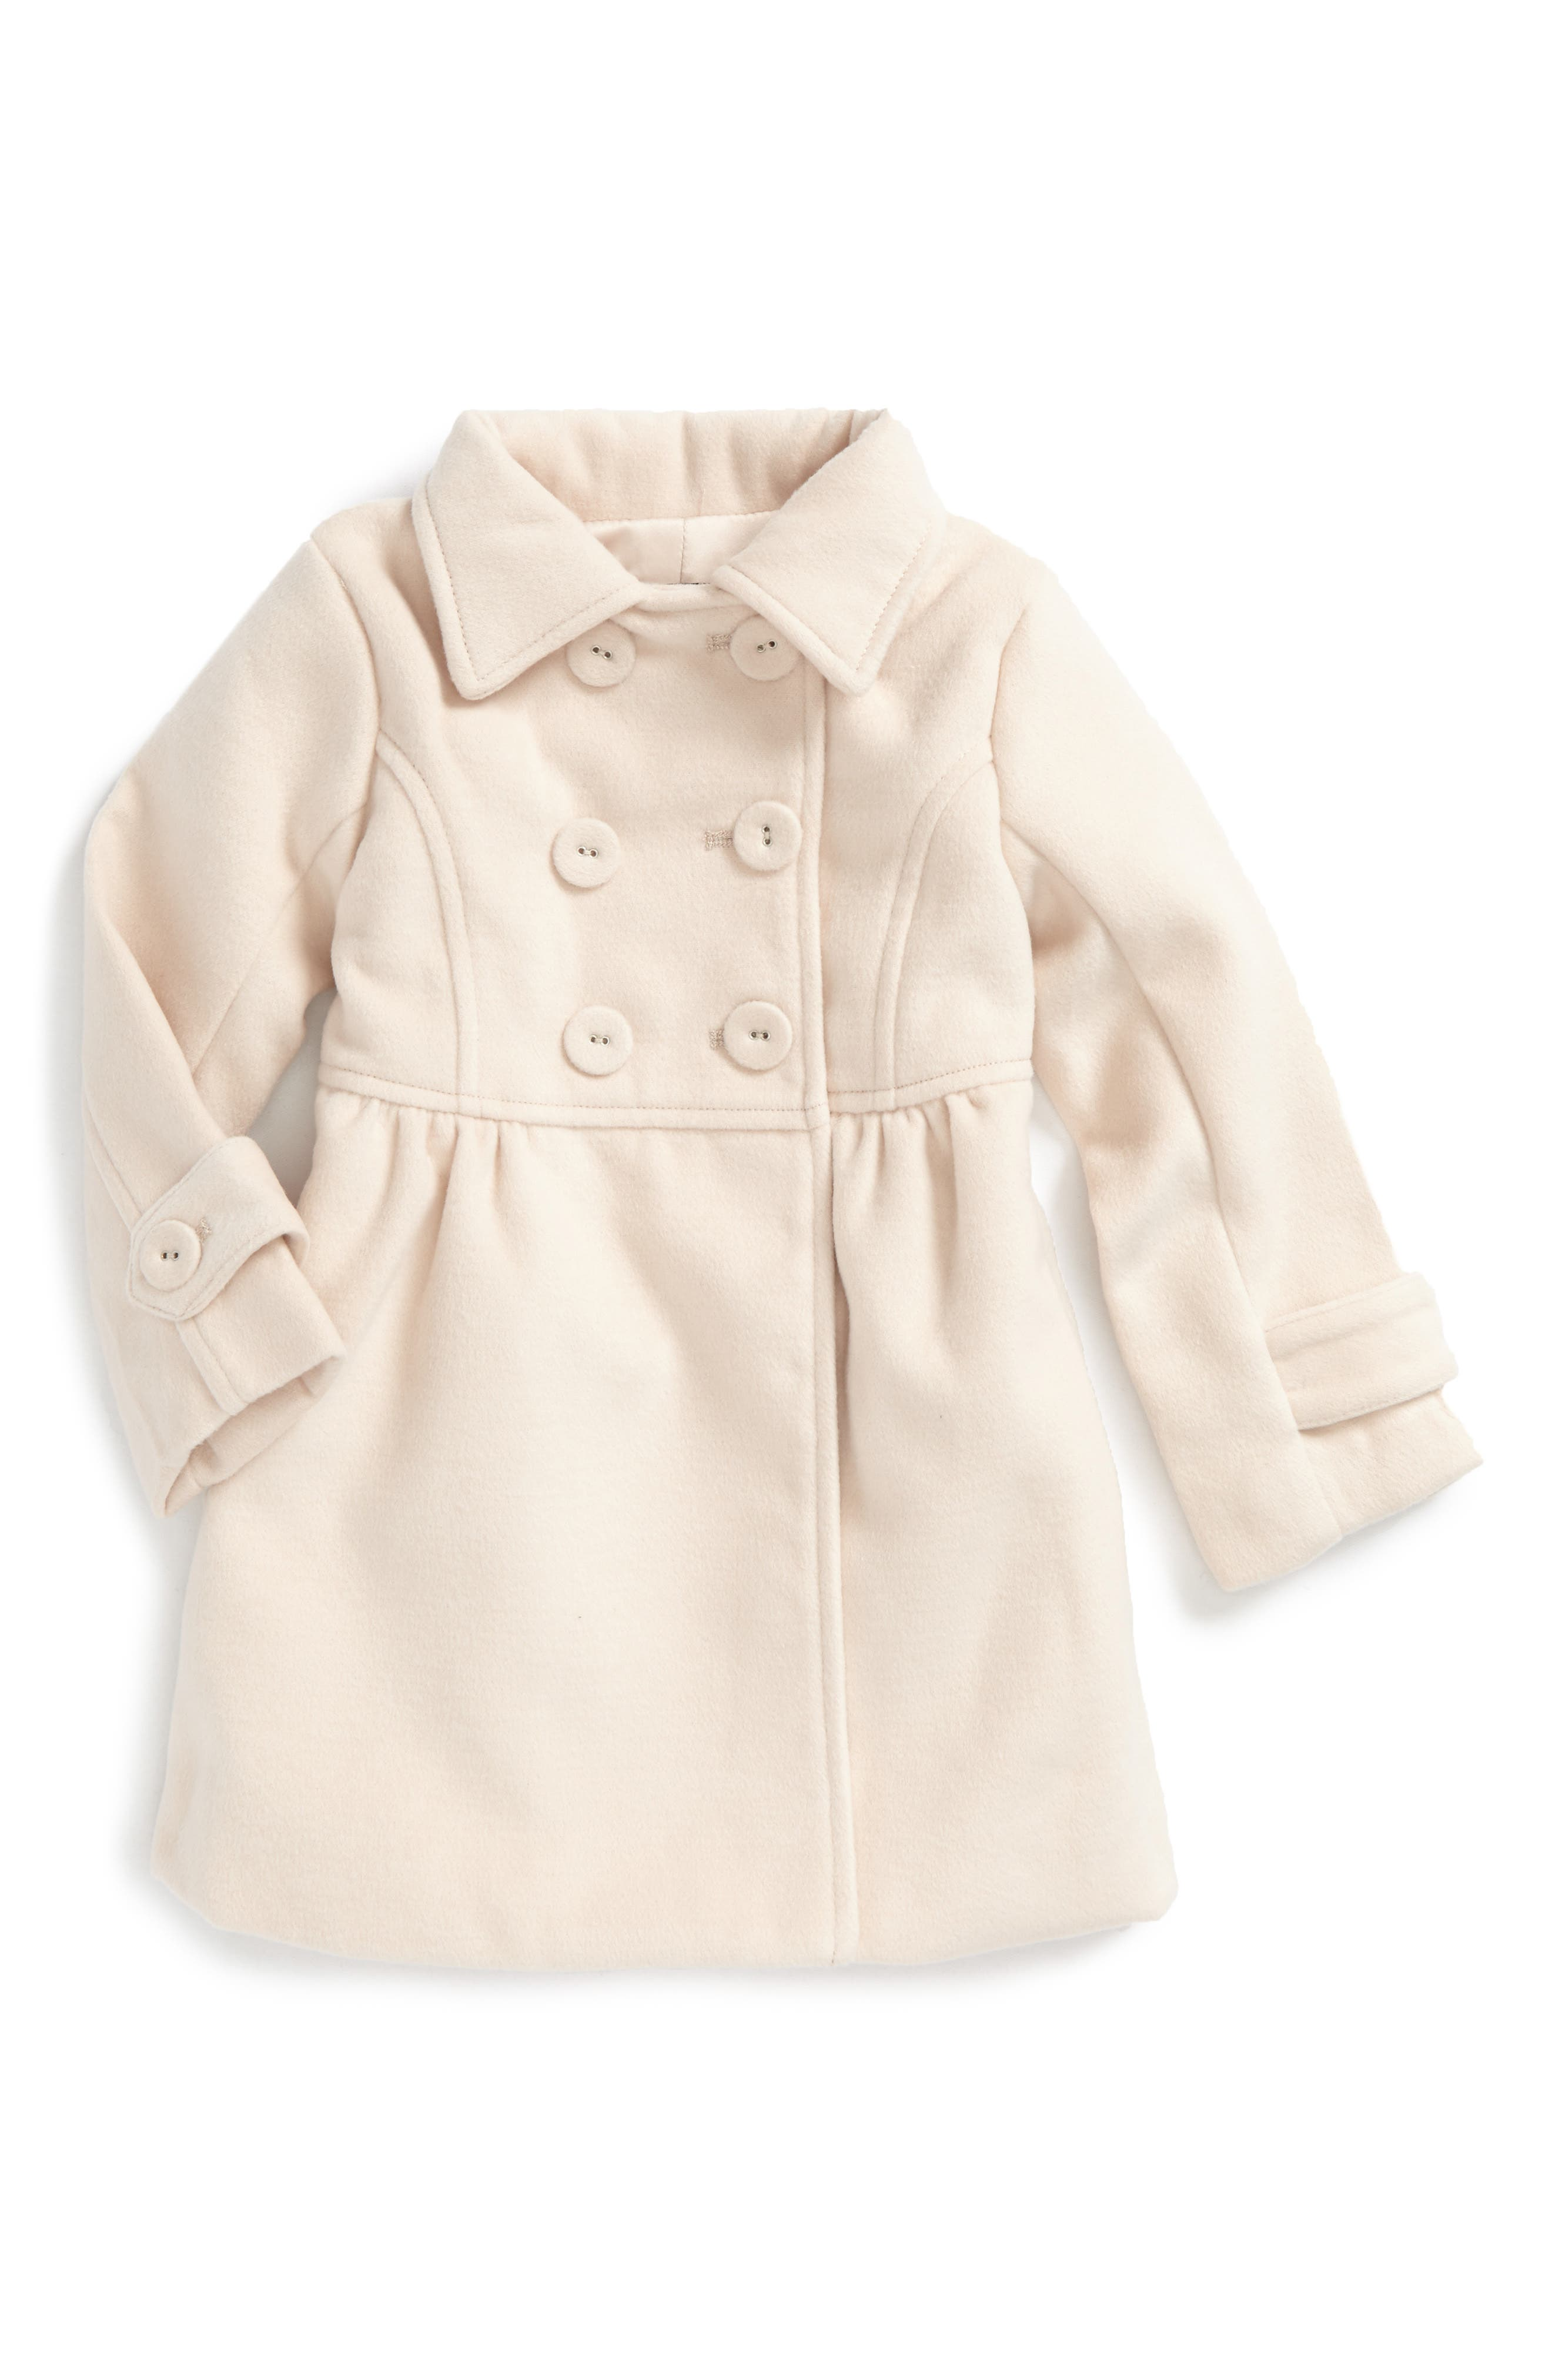 Main Image - Bardot Junior Peacoat (Baby Girls & Toddler Girls)